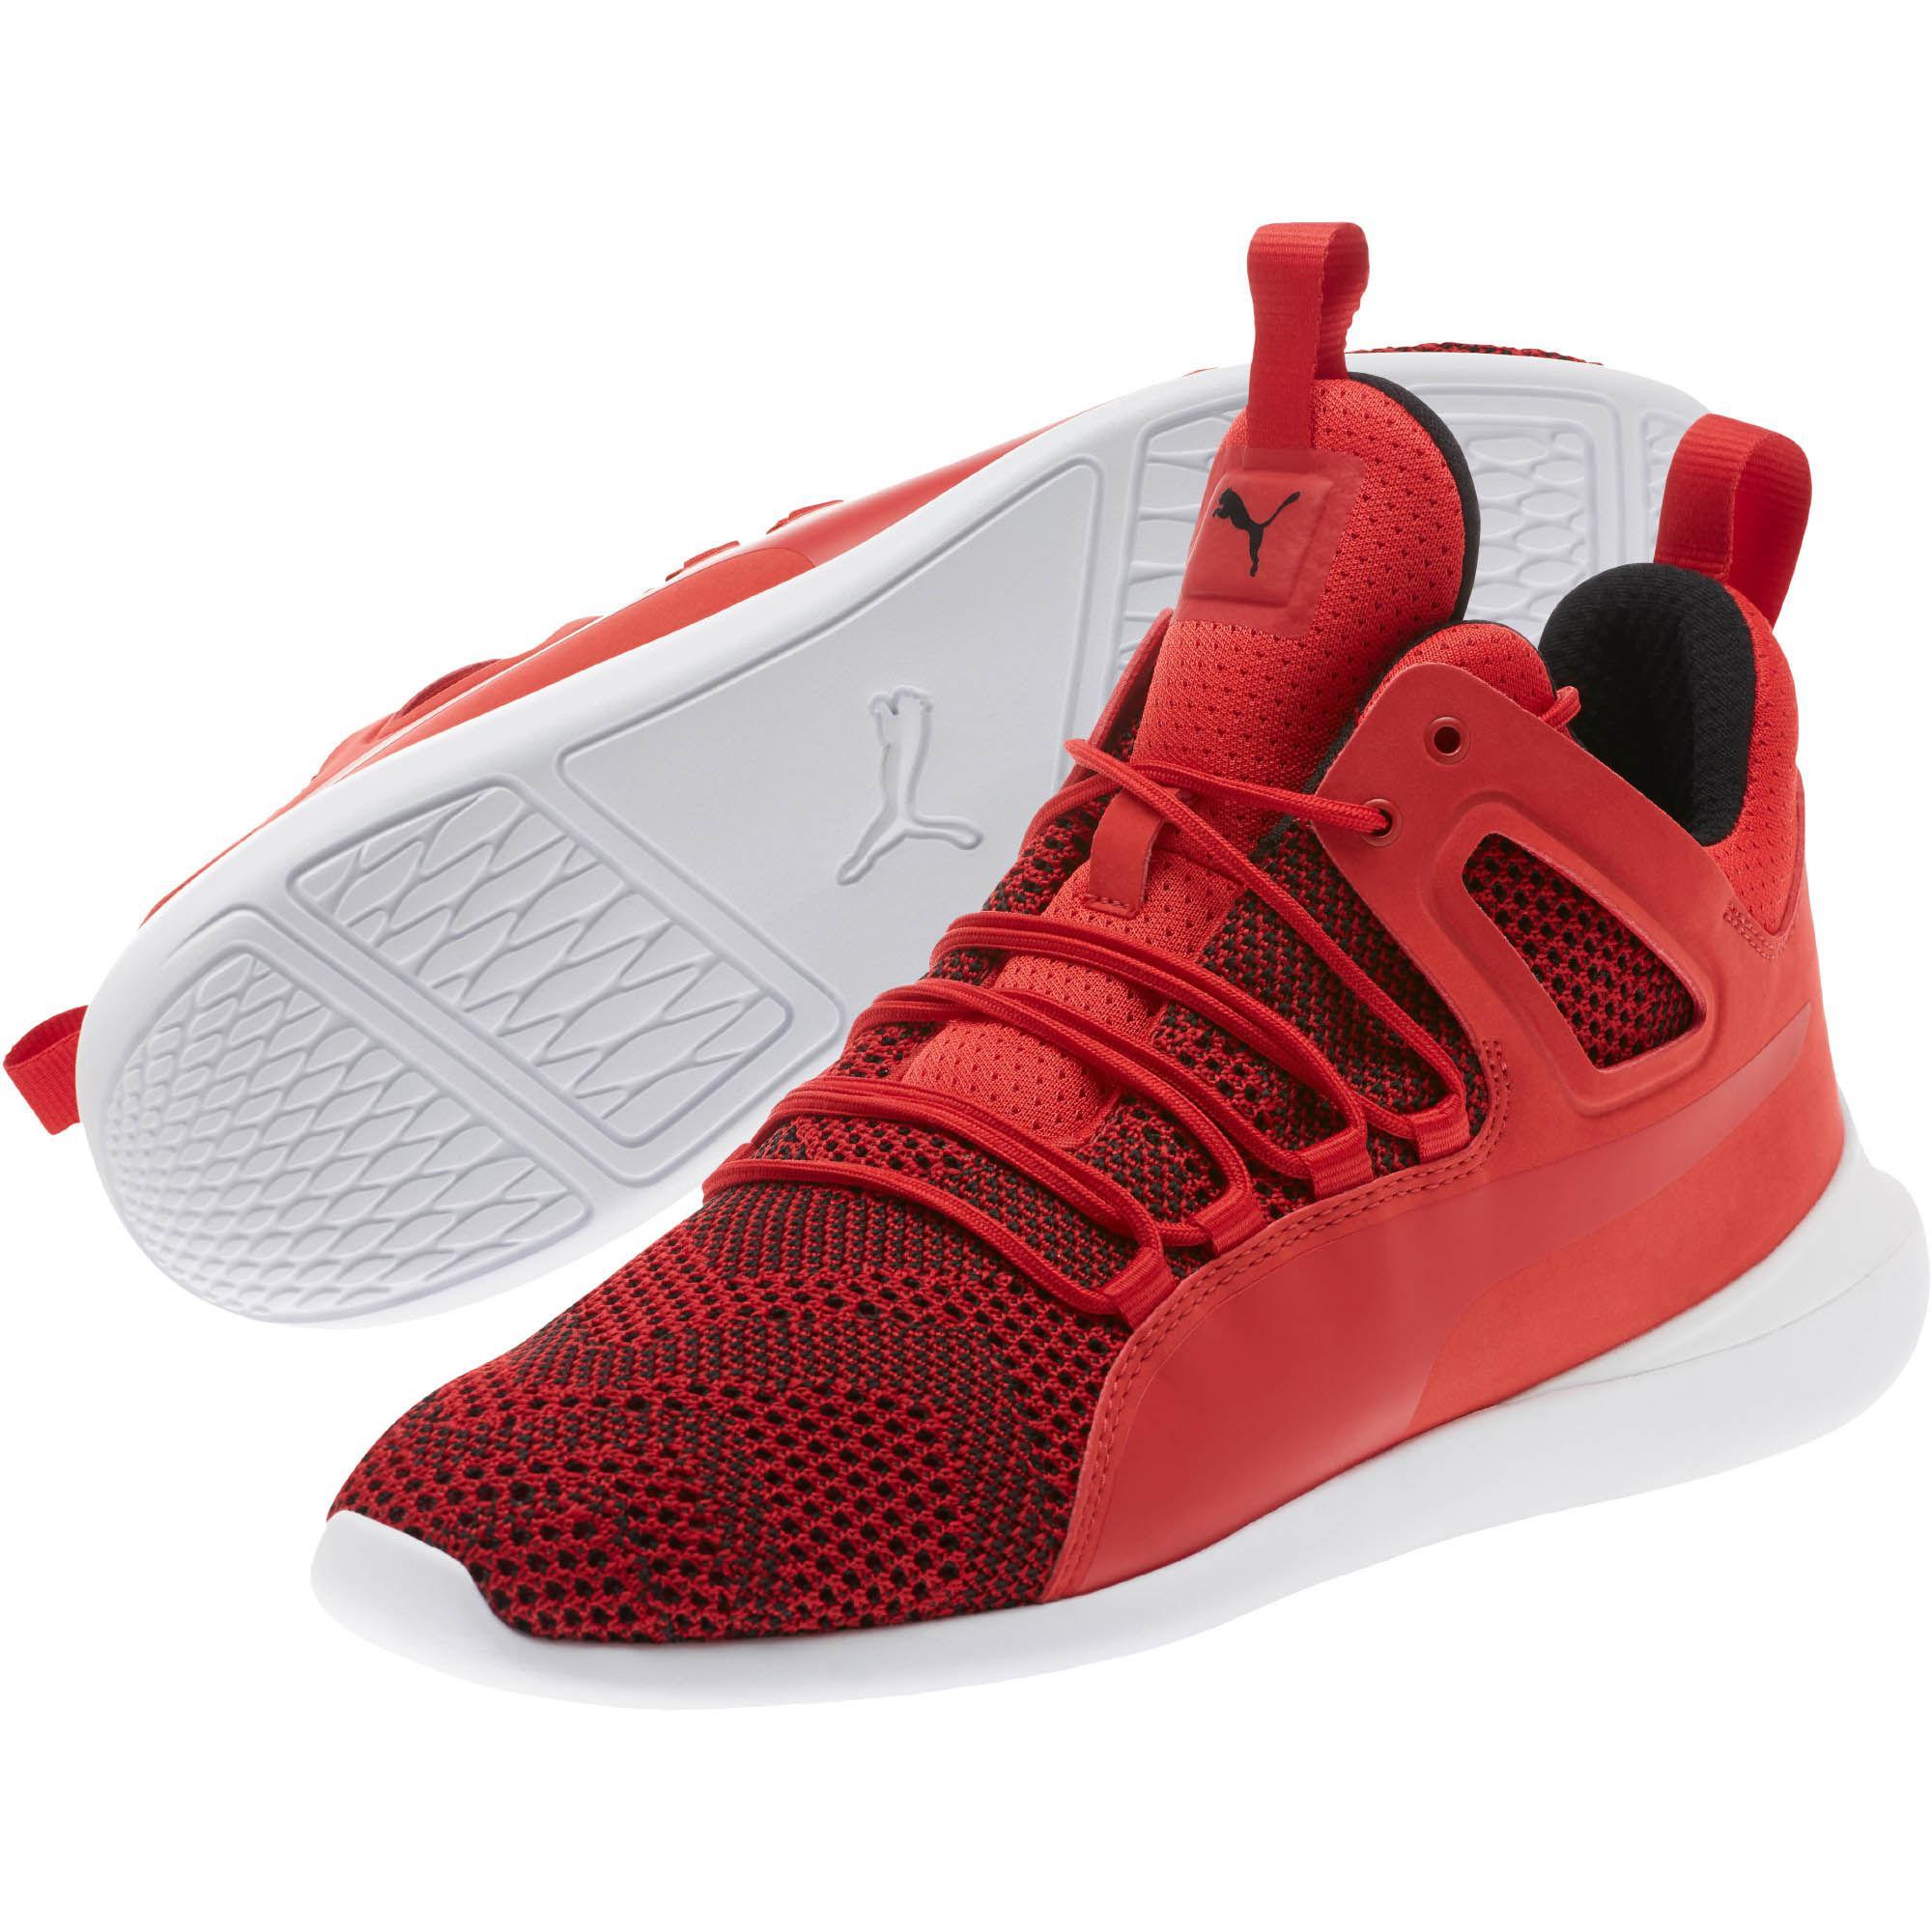 mens puma corsa in white roma belt rosso ferrari shoes scuderia gallery lyst sneakers men for red s